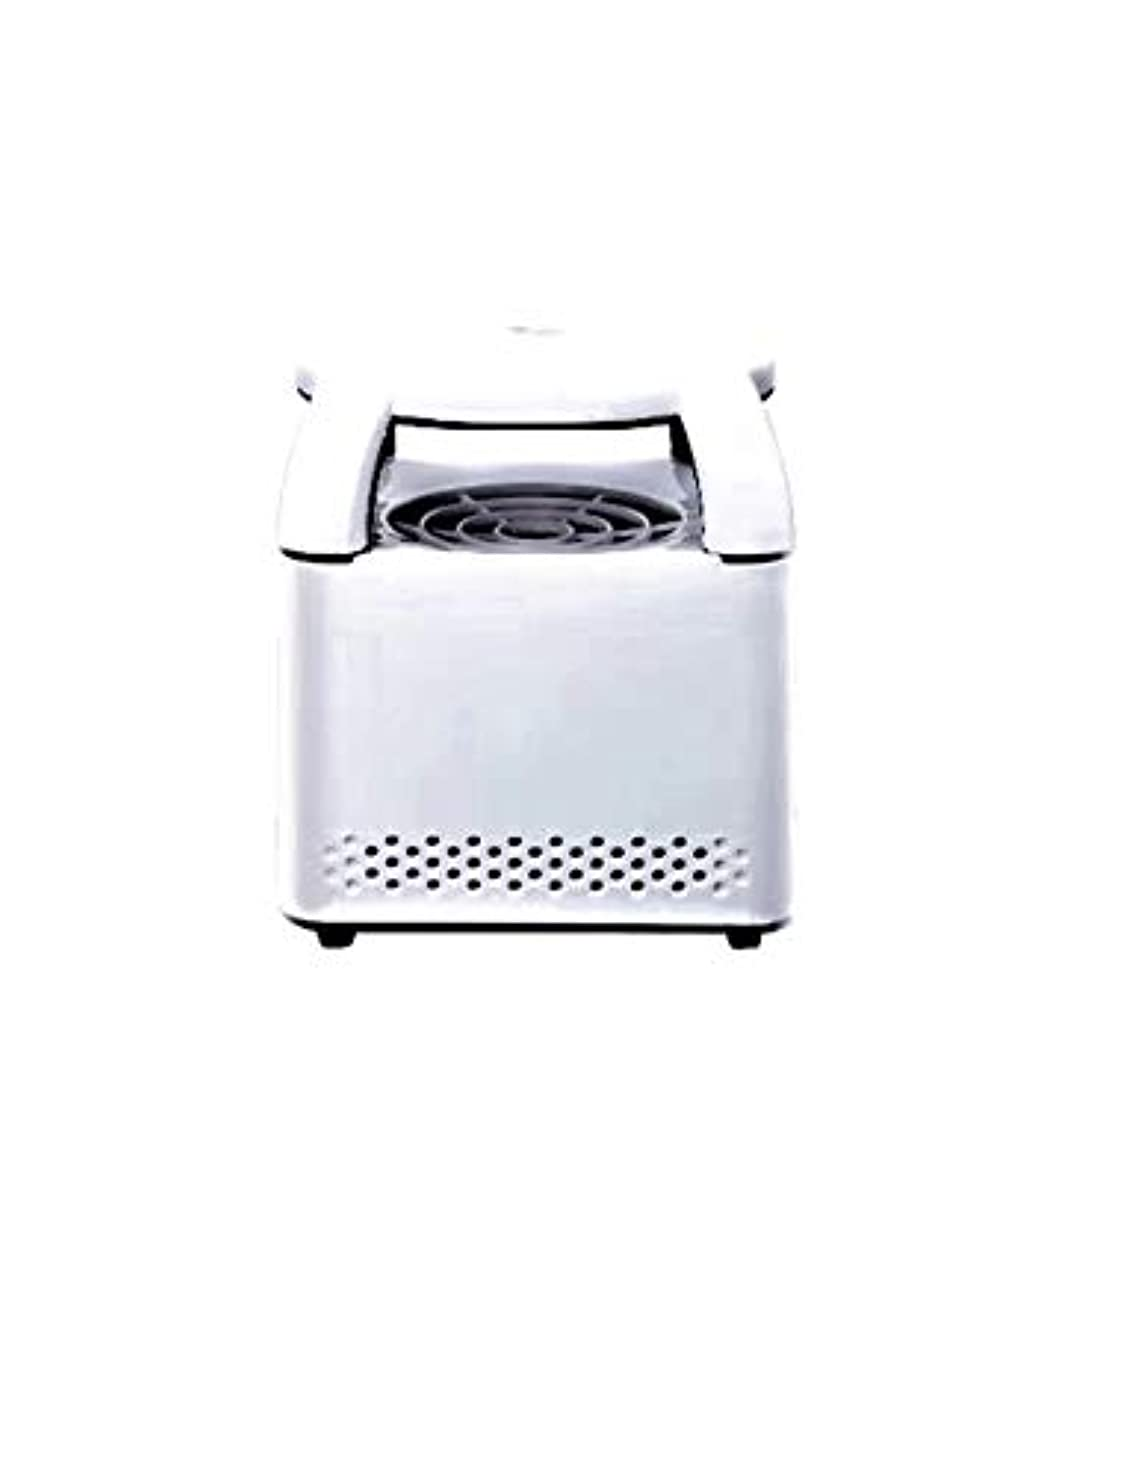 Led蚊キラーusb充電5ワット蚊キラートラップいいえ化学組成いいえノイズ妊娠中の女性が使用できる蚊キラーキラー (Color : White)